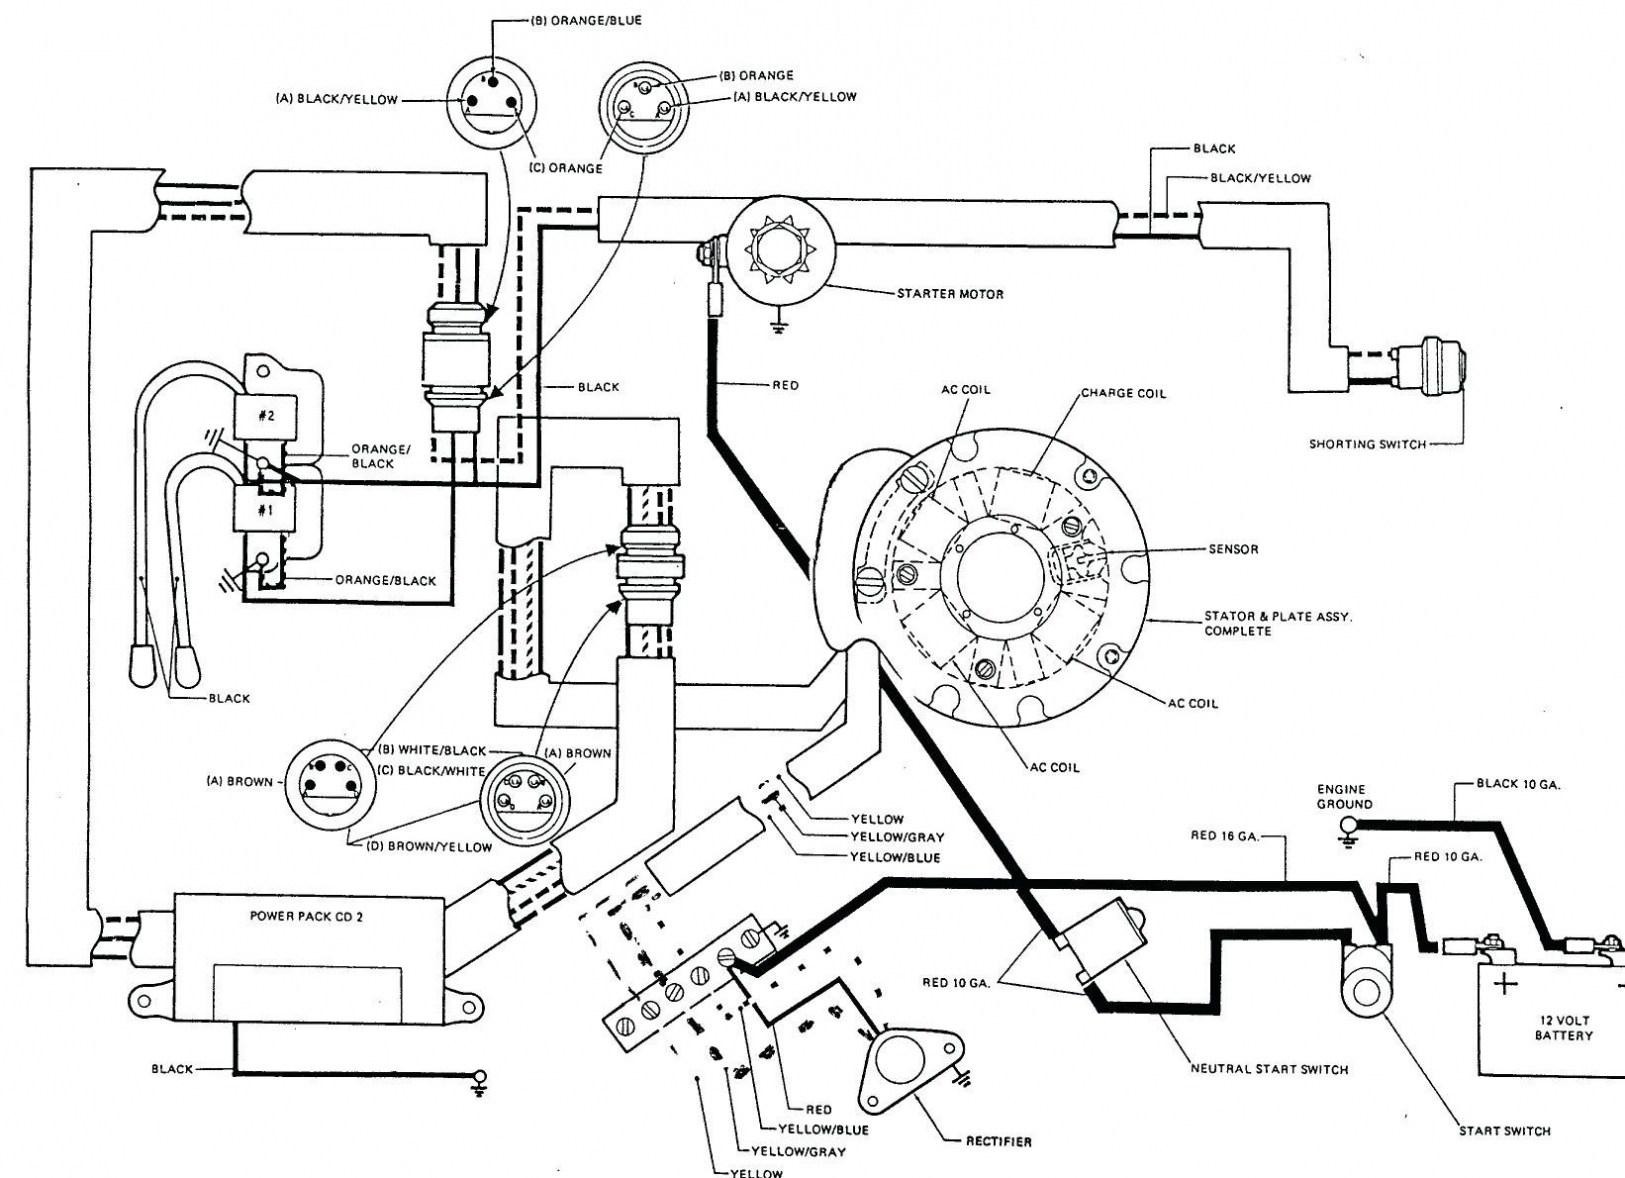 Yamaha 40 Outboard Wiring Diagram | Wiring Diagram - Yamaha Outboard Wiring Diagram Pdf